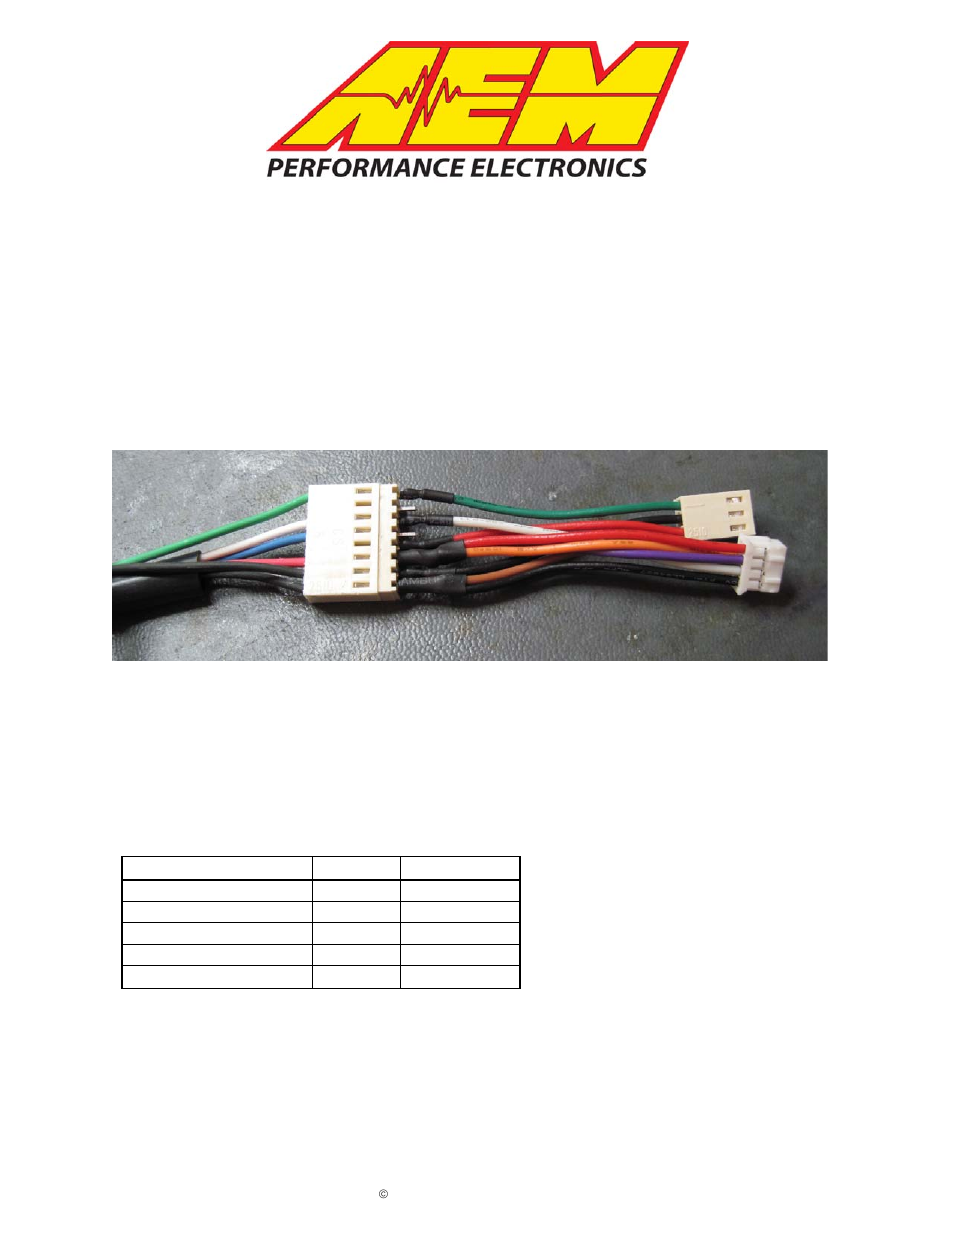 Aem 30 3420 Analog Gauge Wiring Conversion User Manual 2 Pages Psi Harness